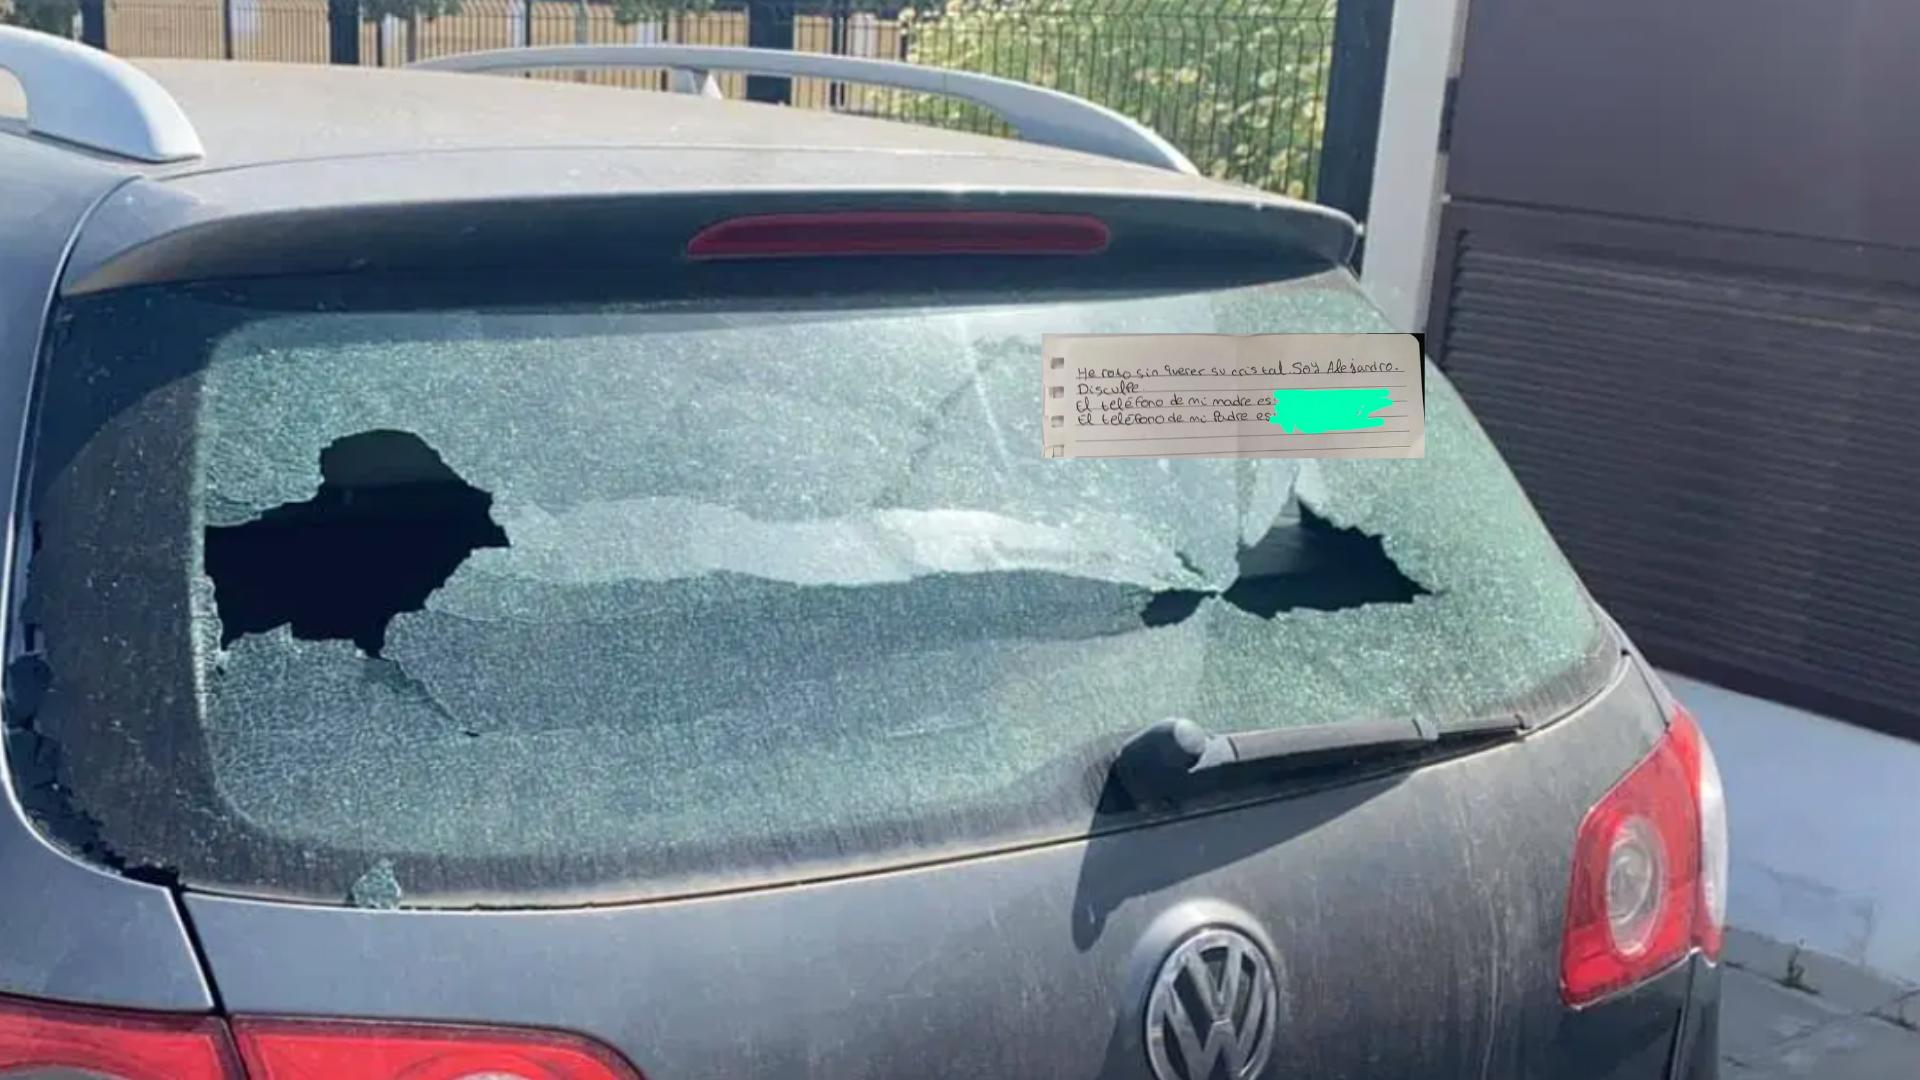 Niño pidió perdón con un post en el carro que le rompió el vidrió